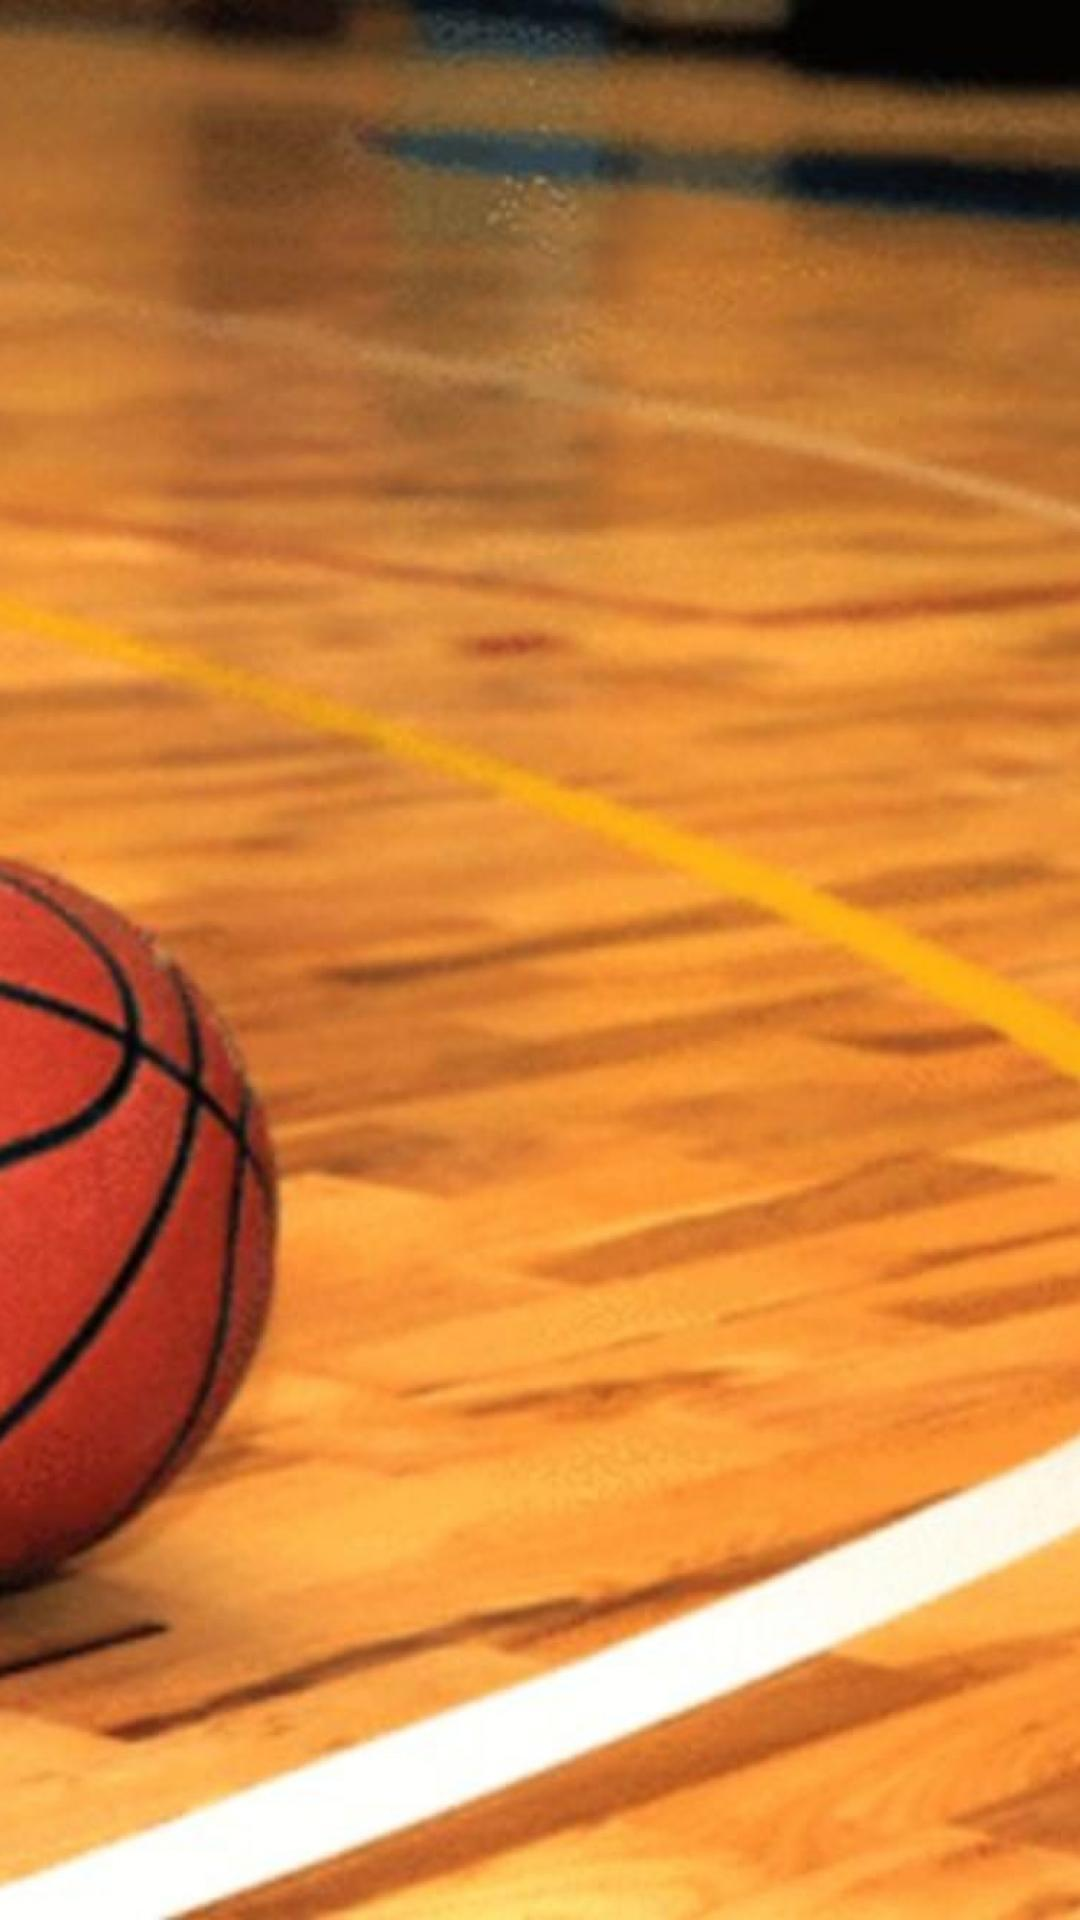 [71+] Basketball Court Wallpapers on WallpaperSafari